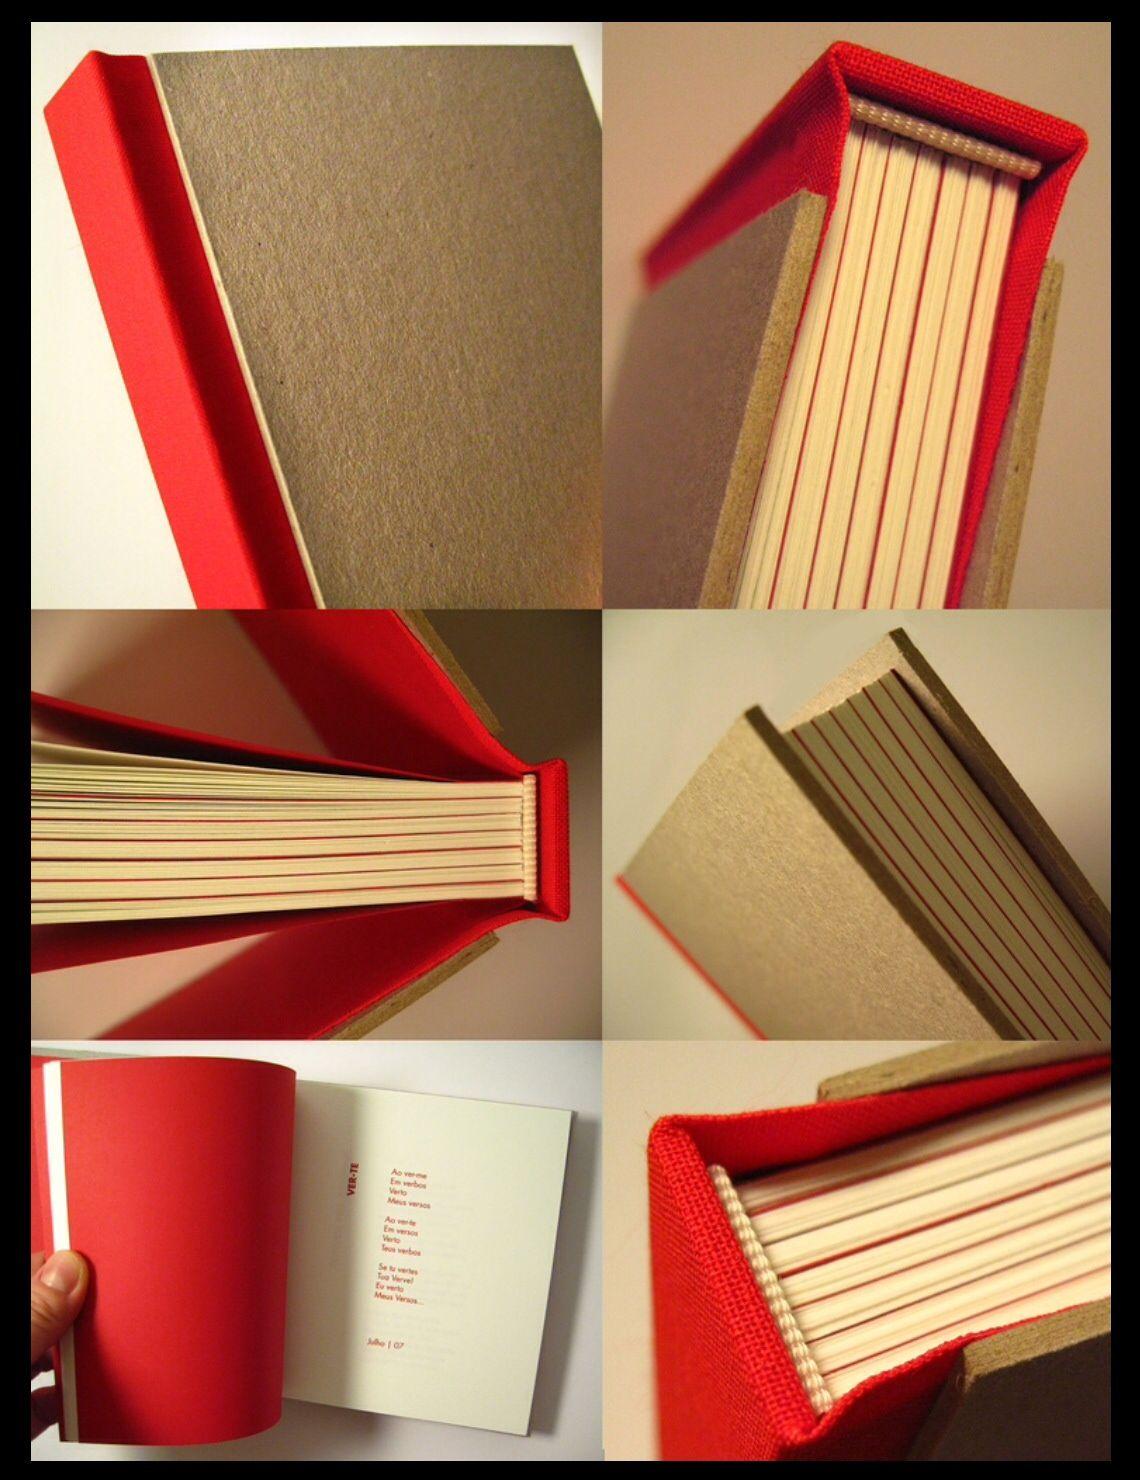 Pin By Gavin King On Bookbinding Diy Book Book Making Bookbinding Tutorial